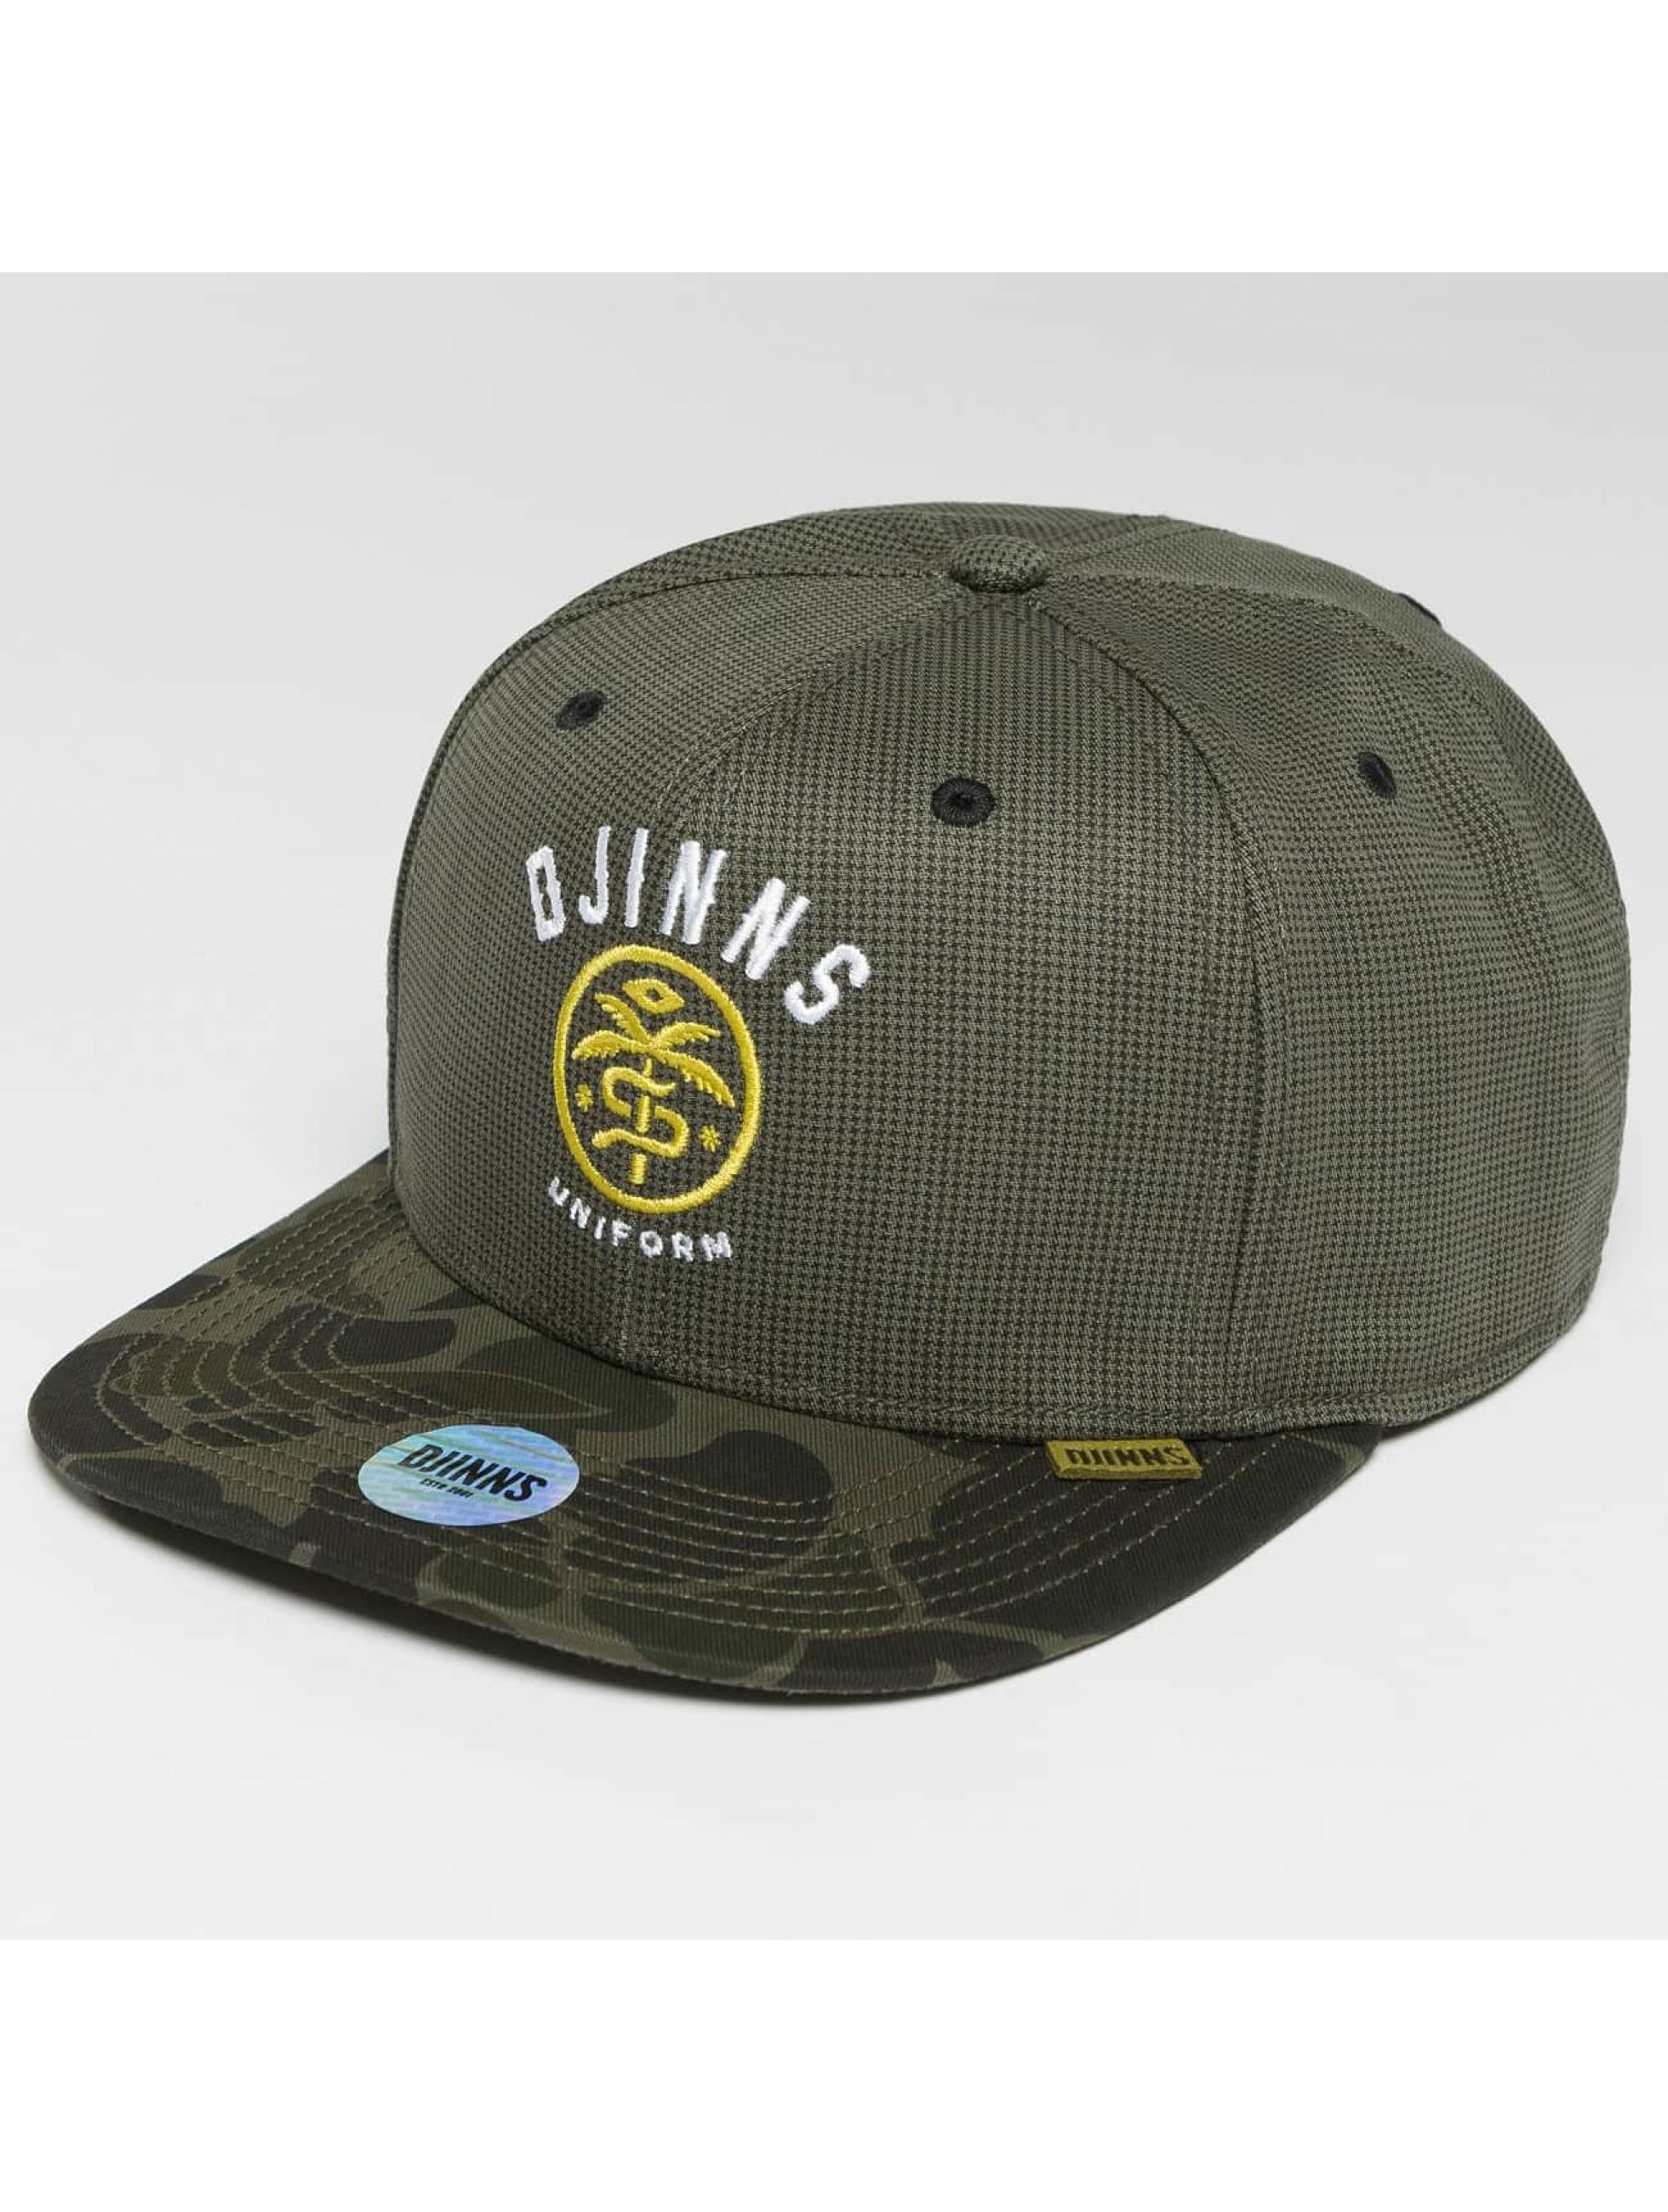 Djinns Casquette Snapback & Strapback Camo Snake 6 Panel camouflage